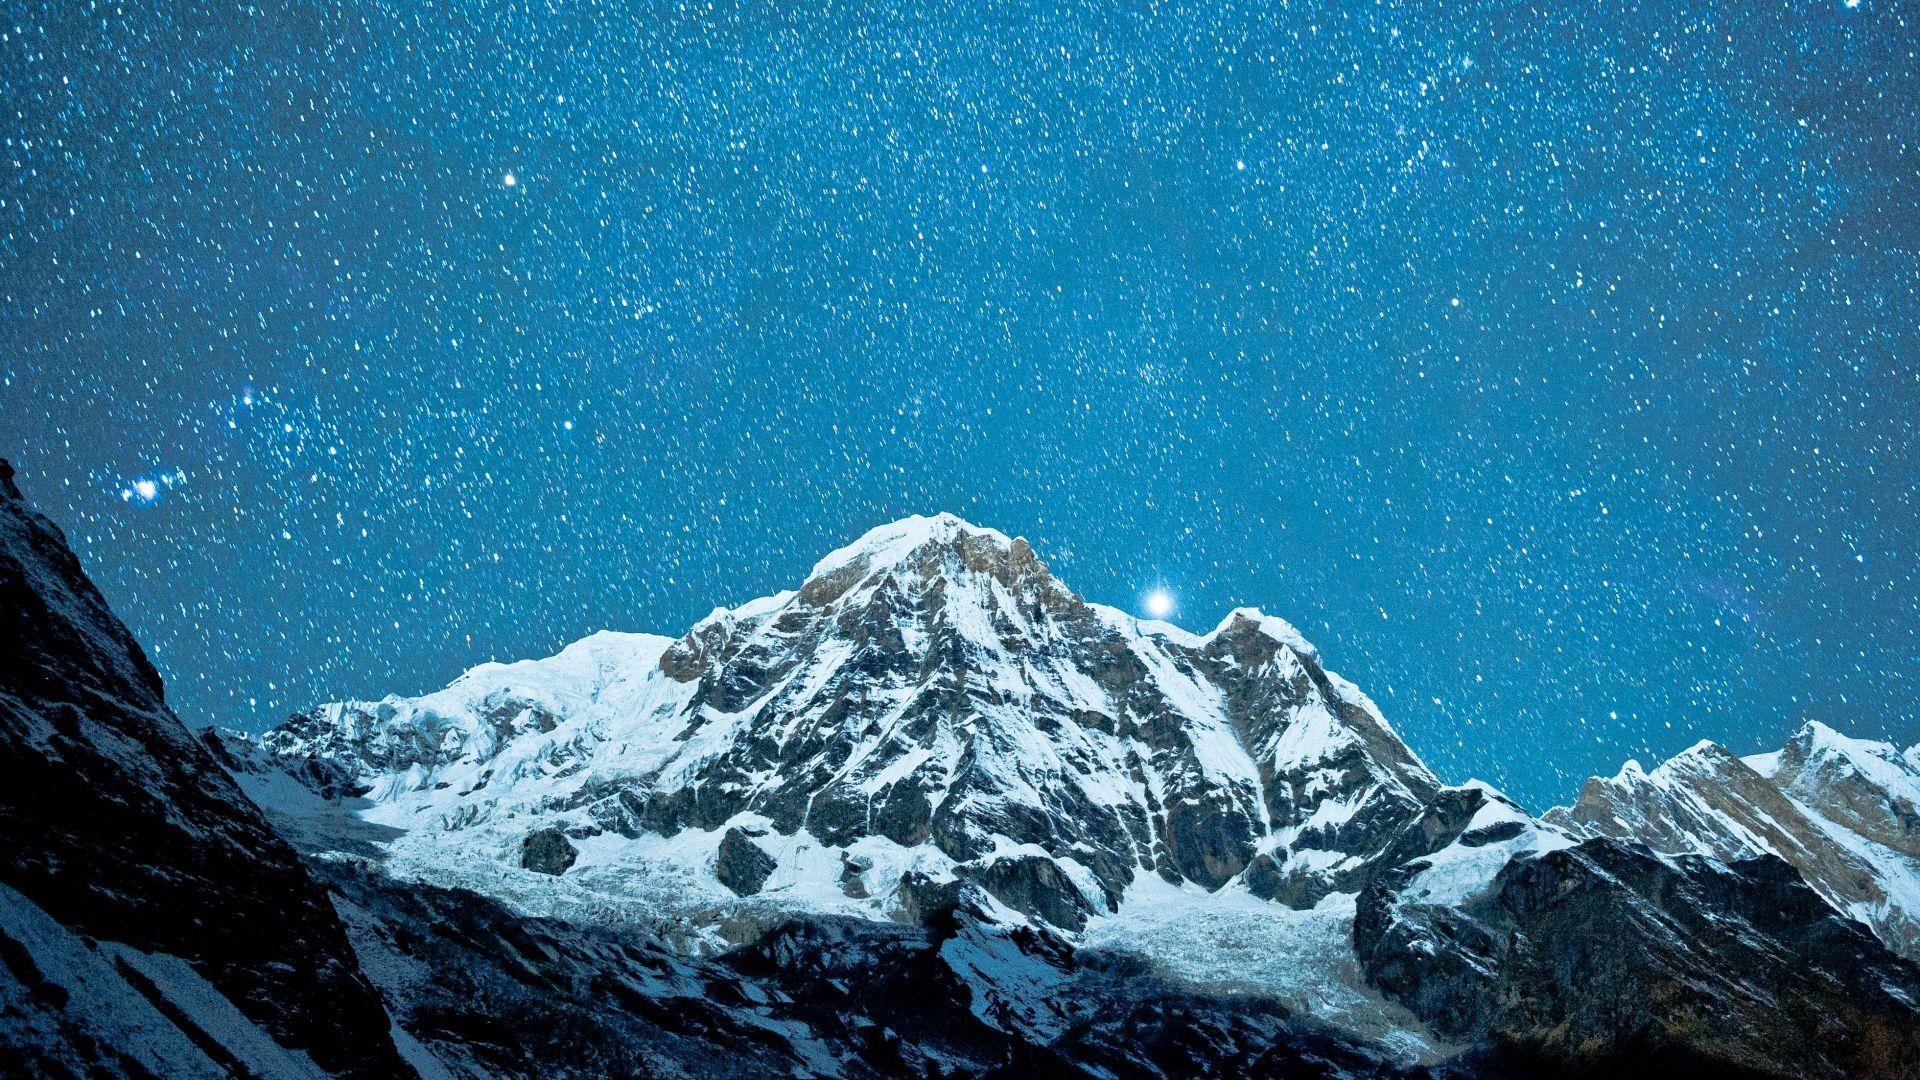 Aranea Highwind Final Fantasy Xv 5k Hd Games 4k: Wallpaper Nepal, 5k, 4k Wallpaper, Himalayas, Night, Stars